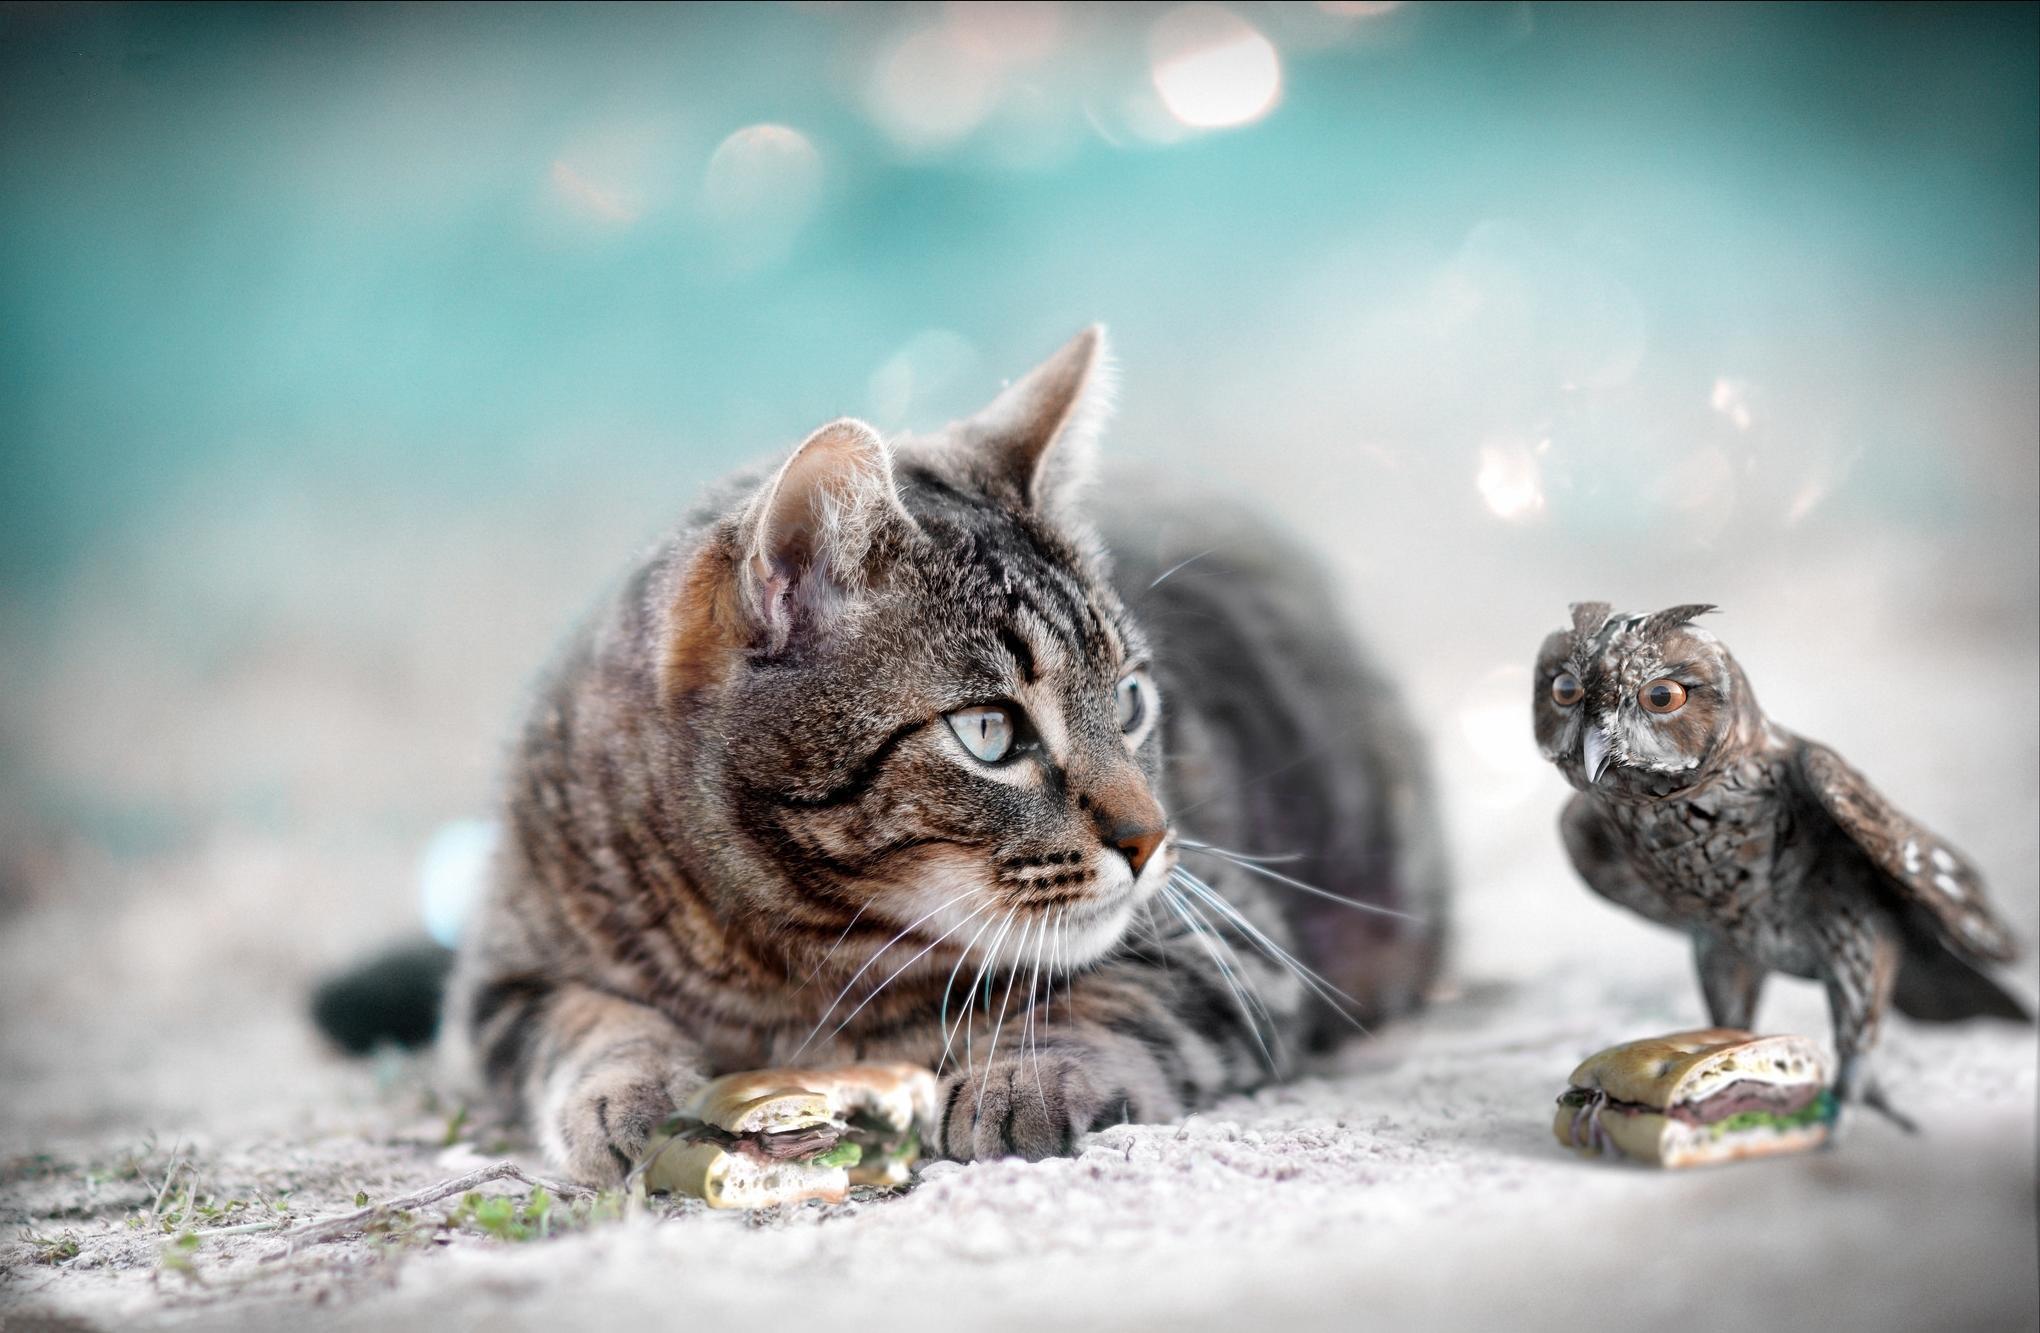 обои кот, кошка, животное, взгляд картинки фото